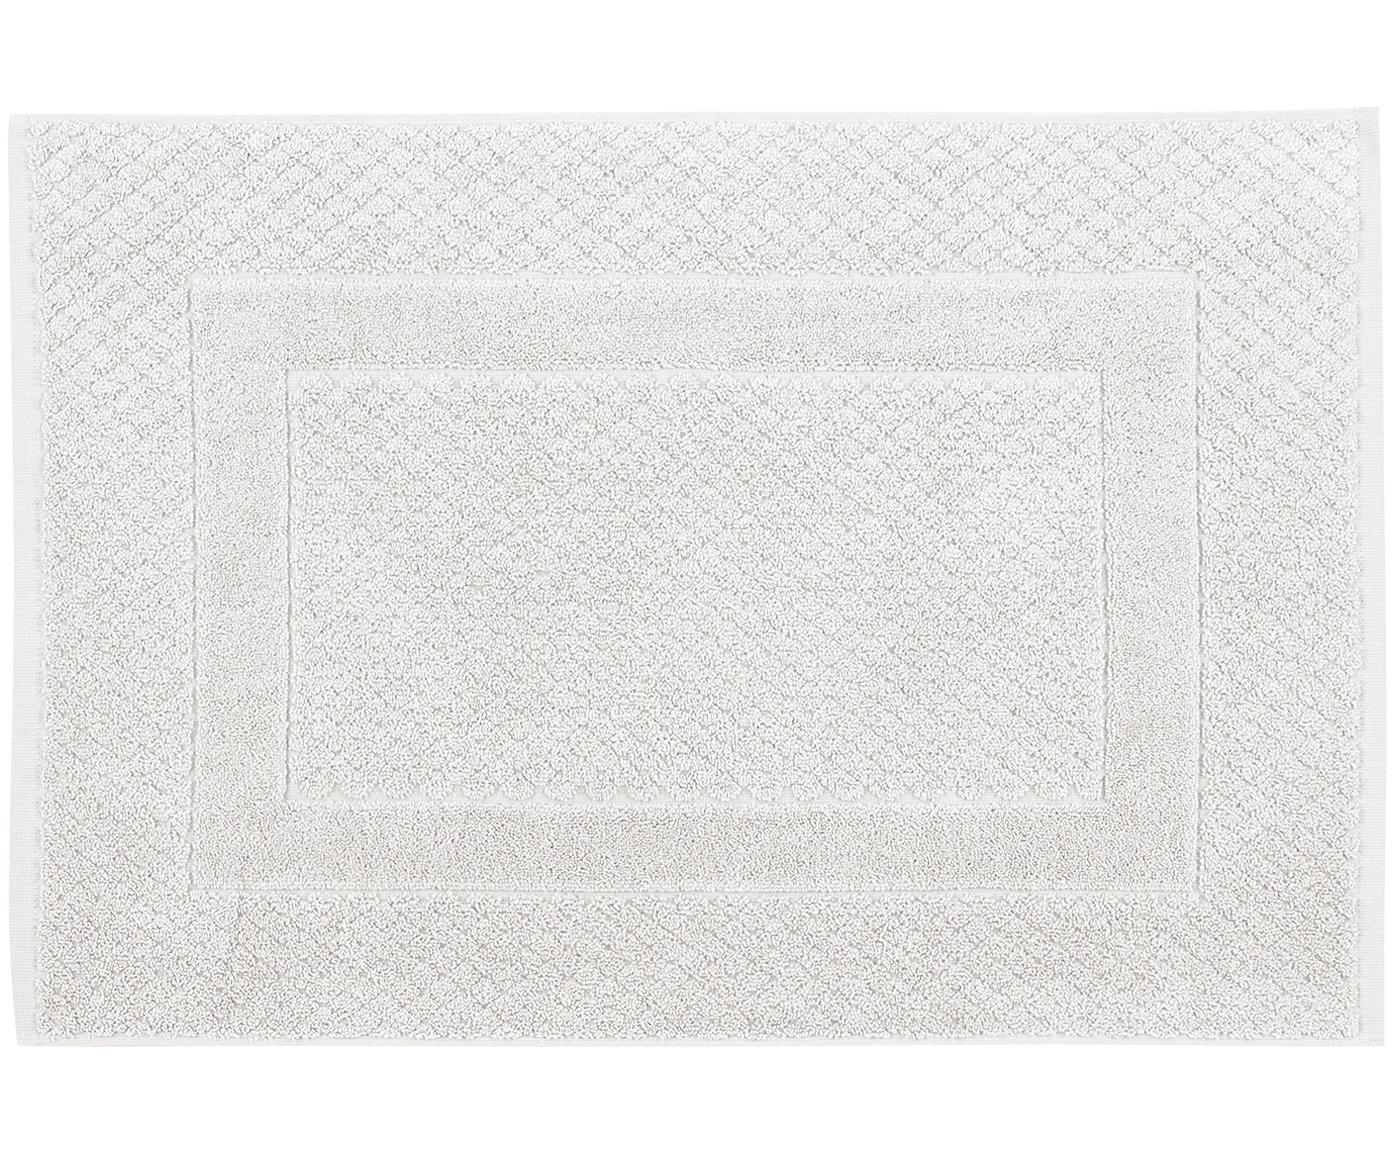 Badmat Katharina, 100% katoen, zware kwaliteit, 900 g/m², Zilvergrijs, 50 x 70 cm